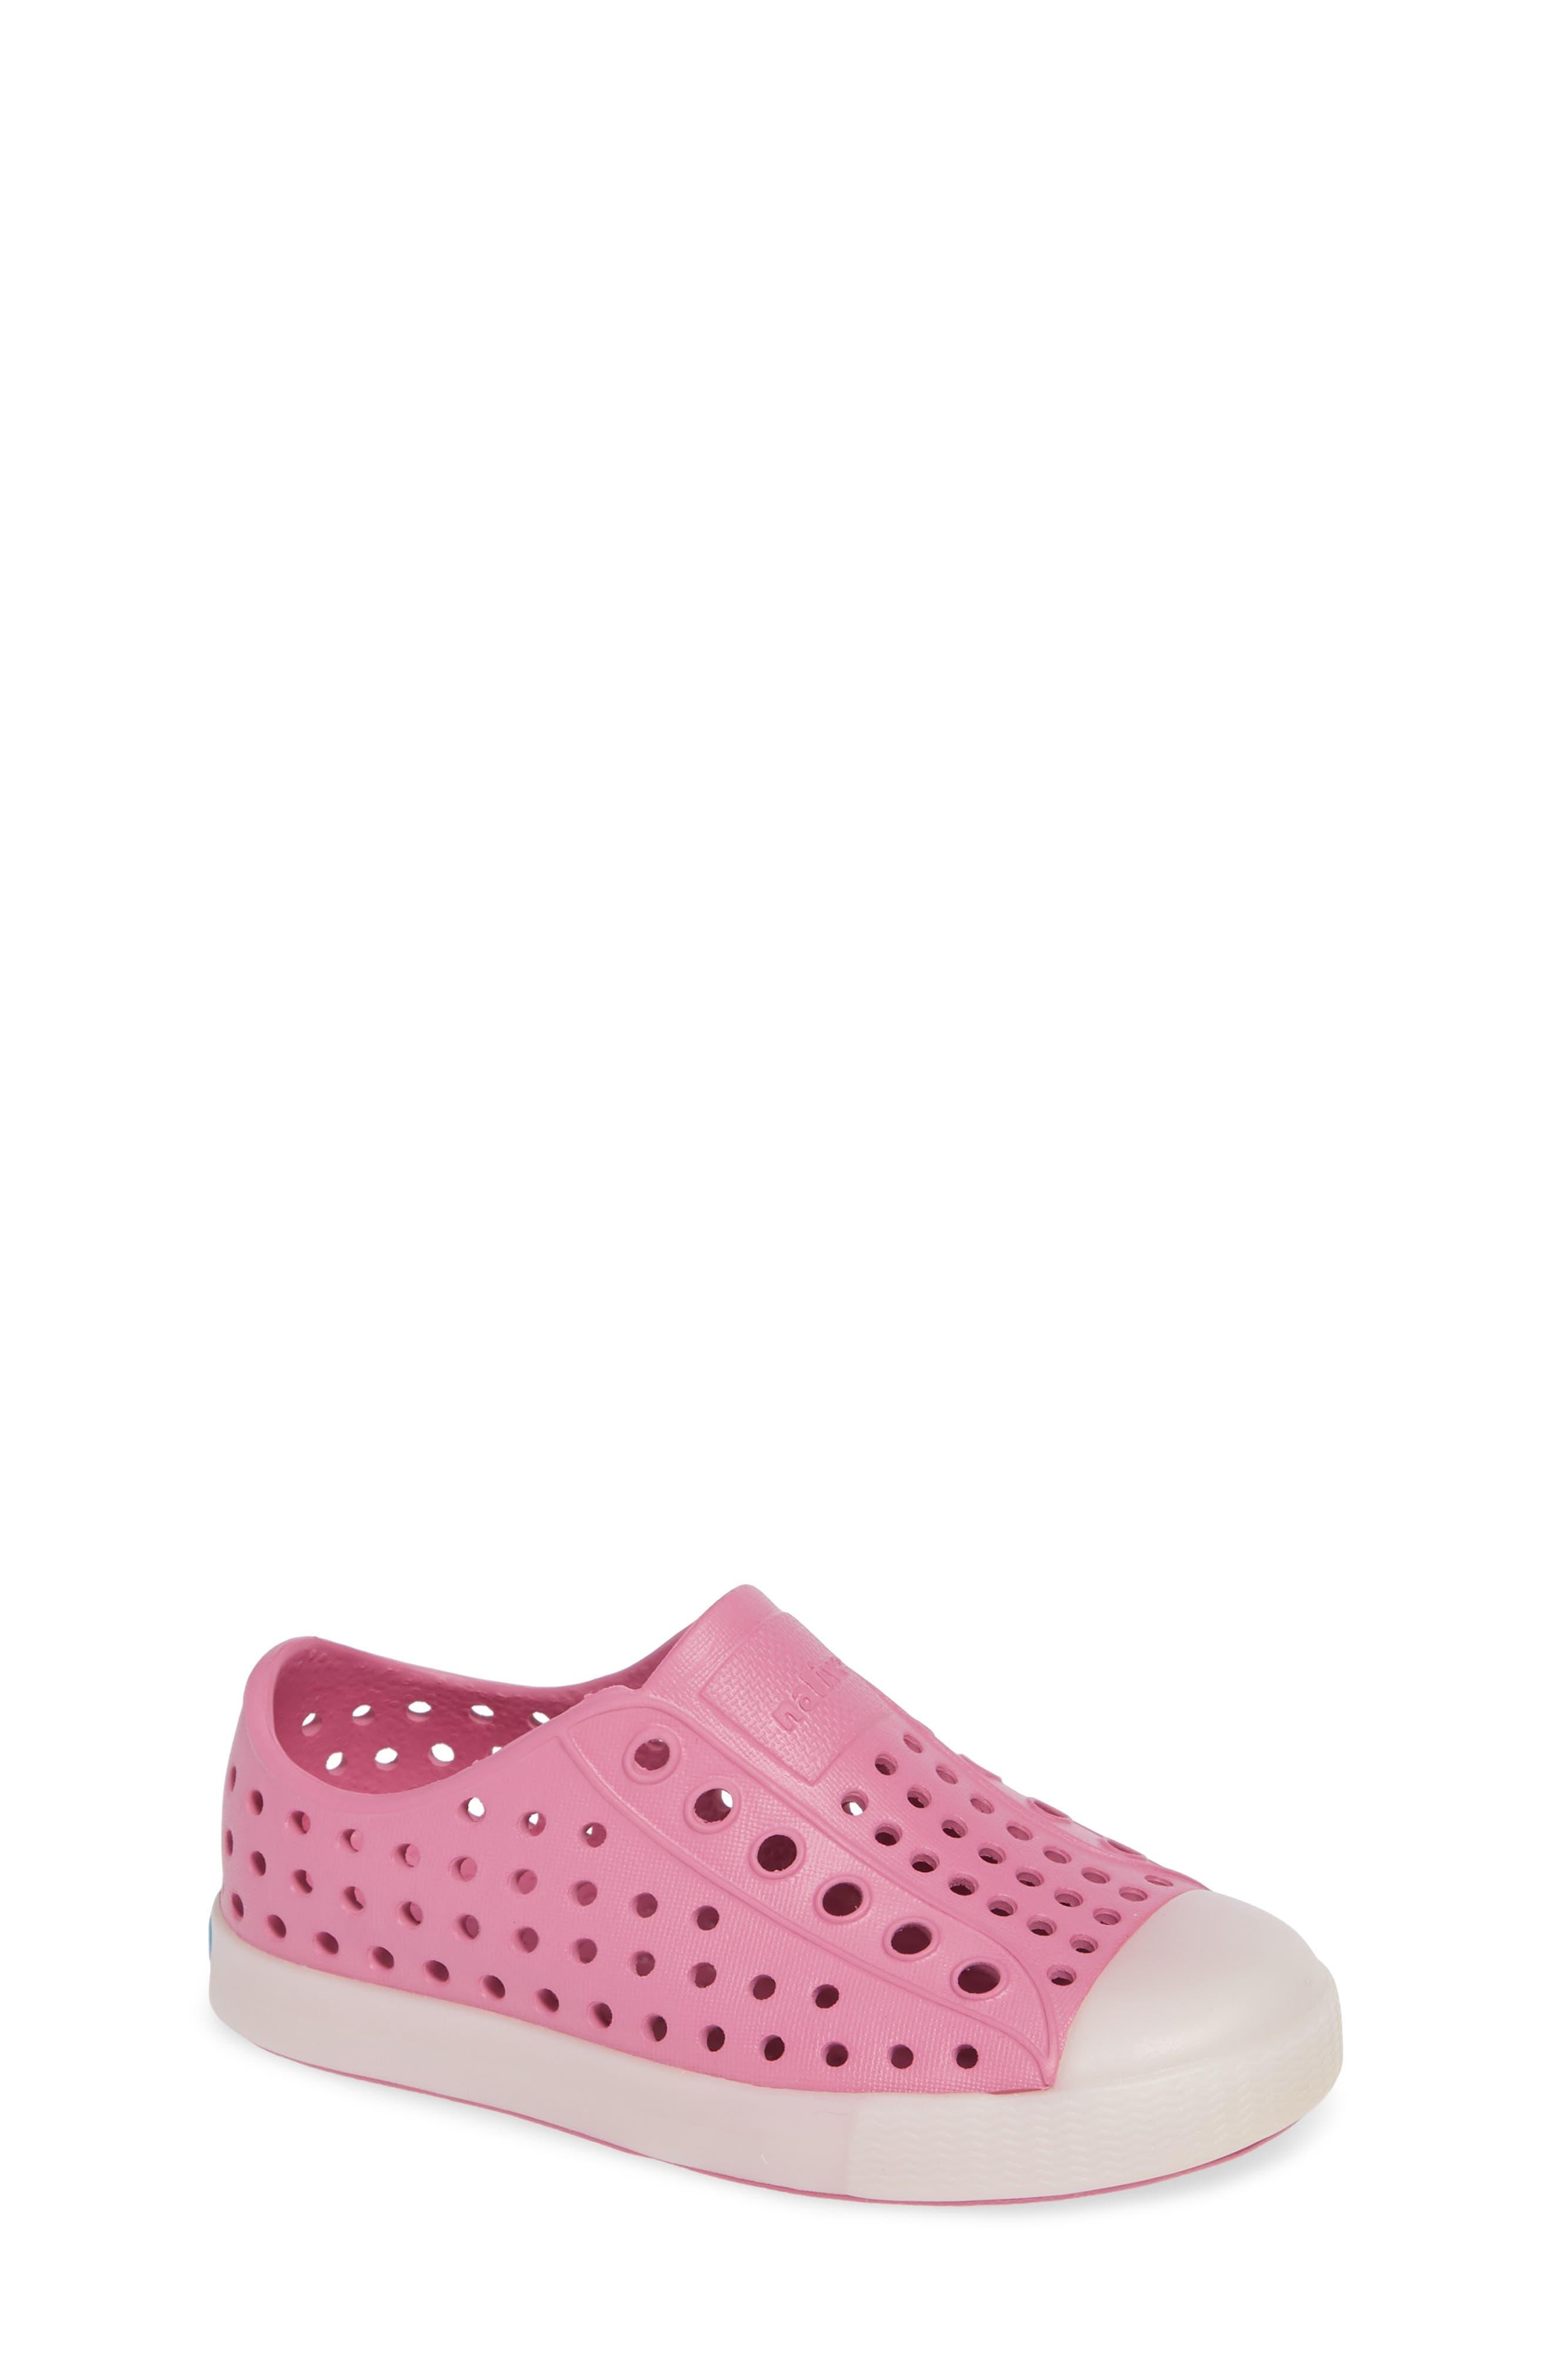 Jefferson - Glow in the Dark Sneaker,                             Main thumbnail 1, color,                             Woodward Pink/ Glow